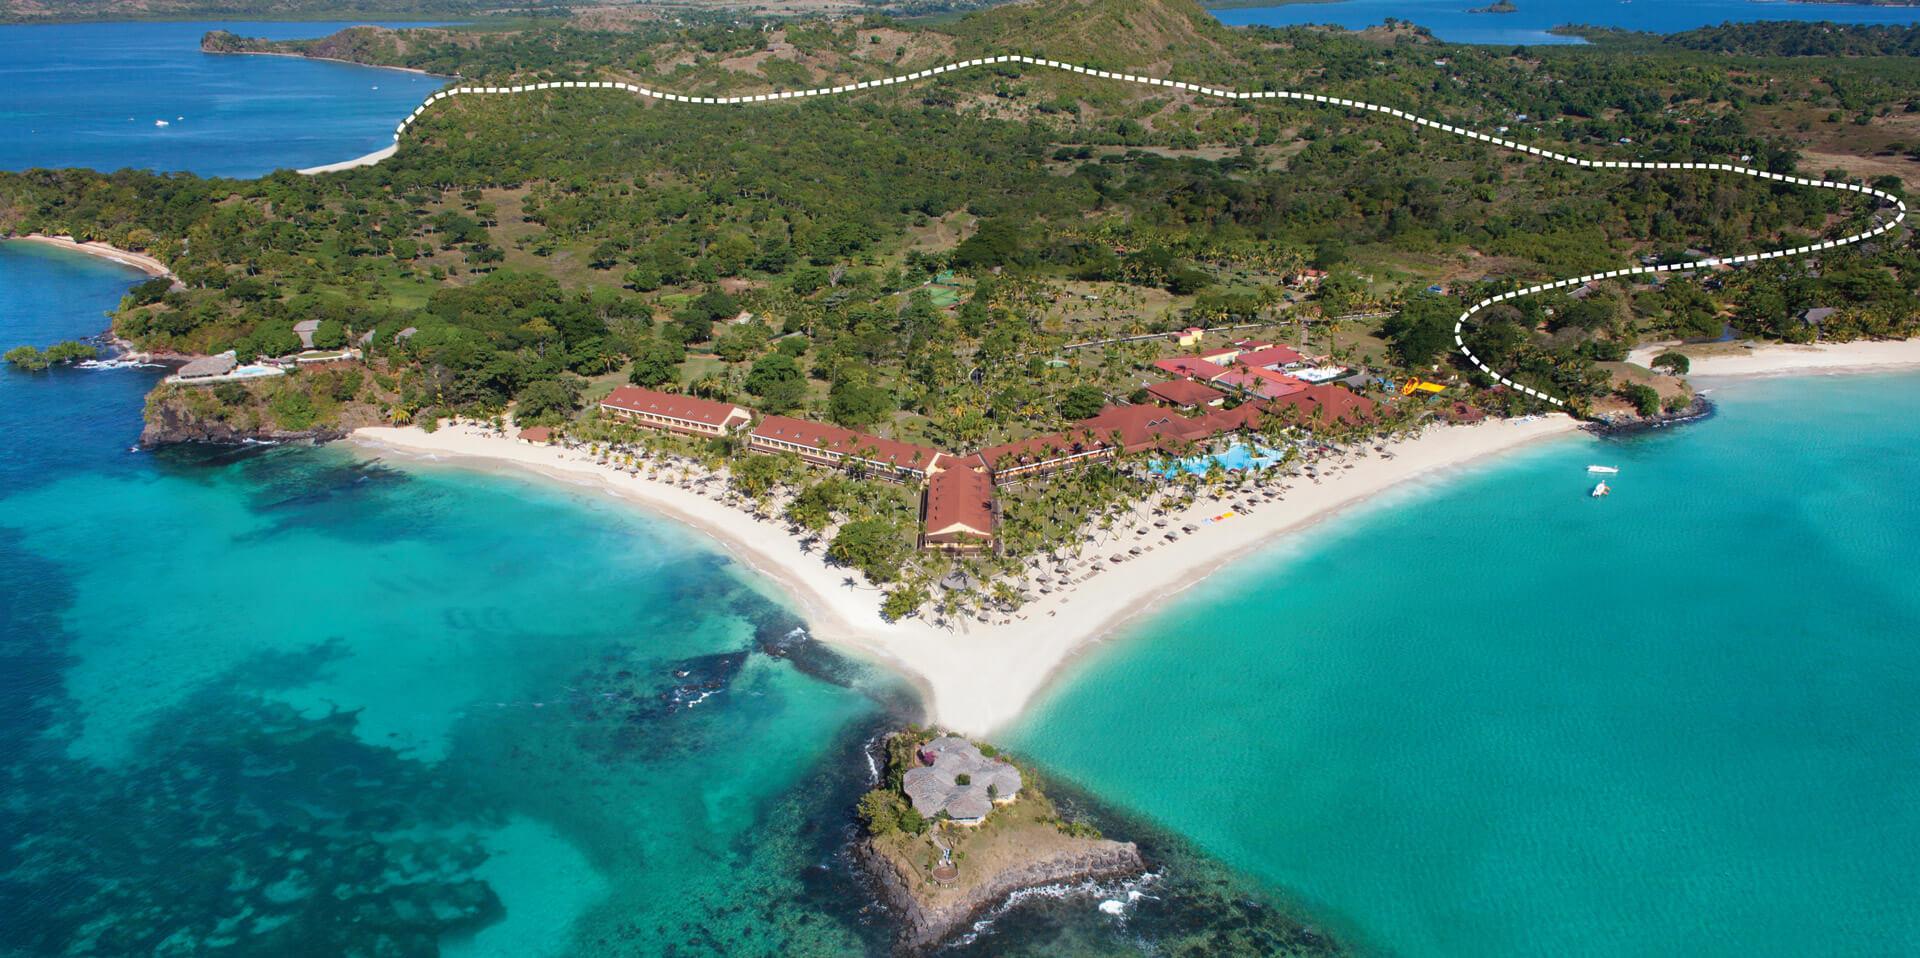 Exclusif Island Private Resort